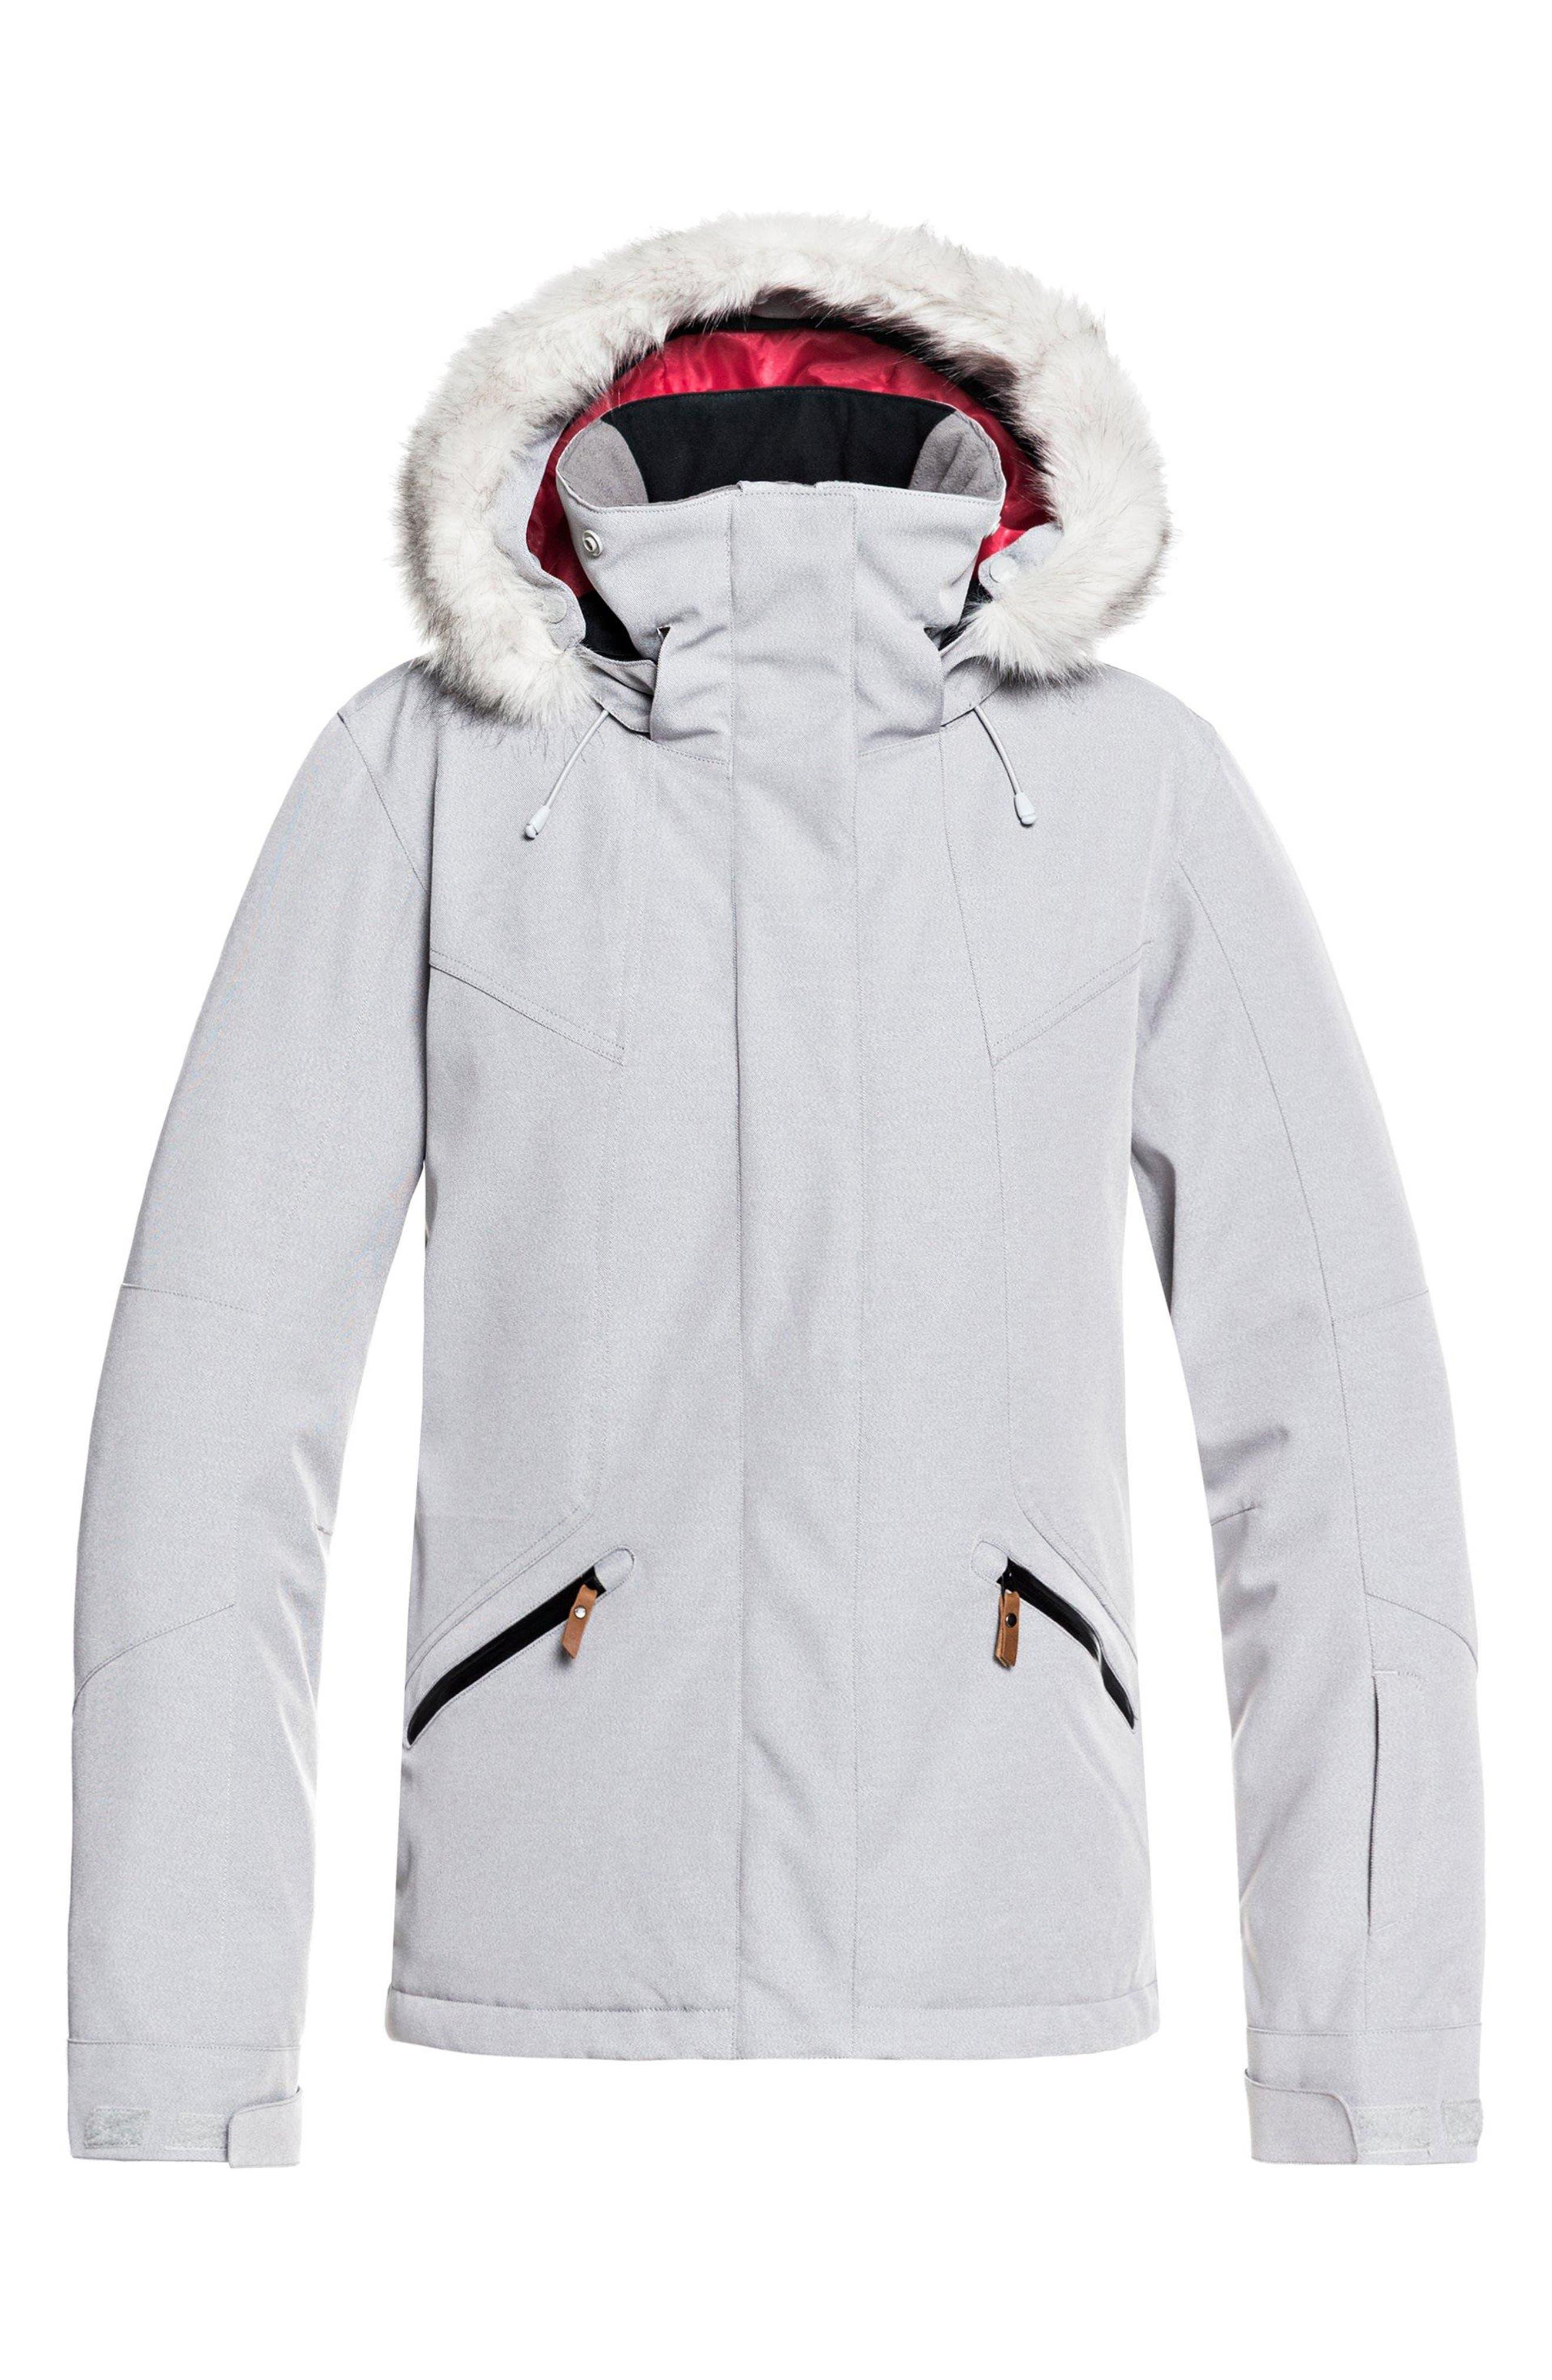 ROXY Atmosphere Snow Jacket, Main, color, 020